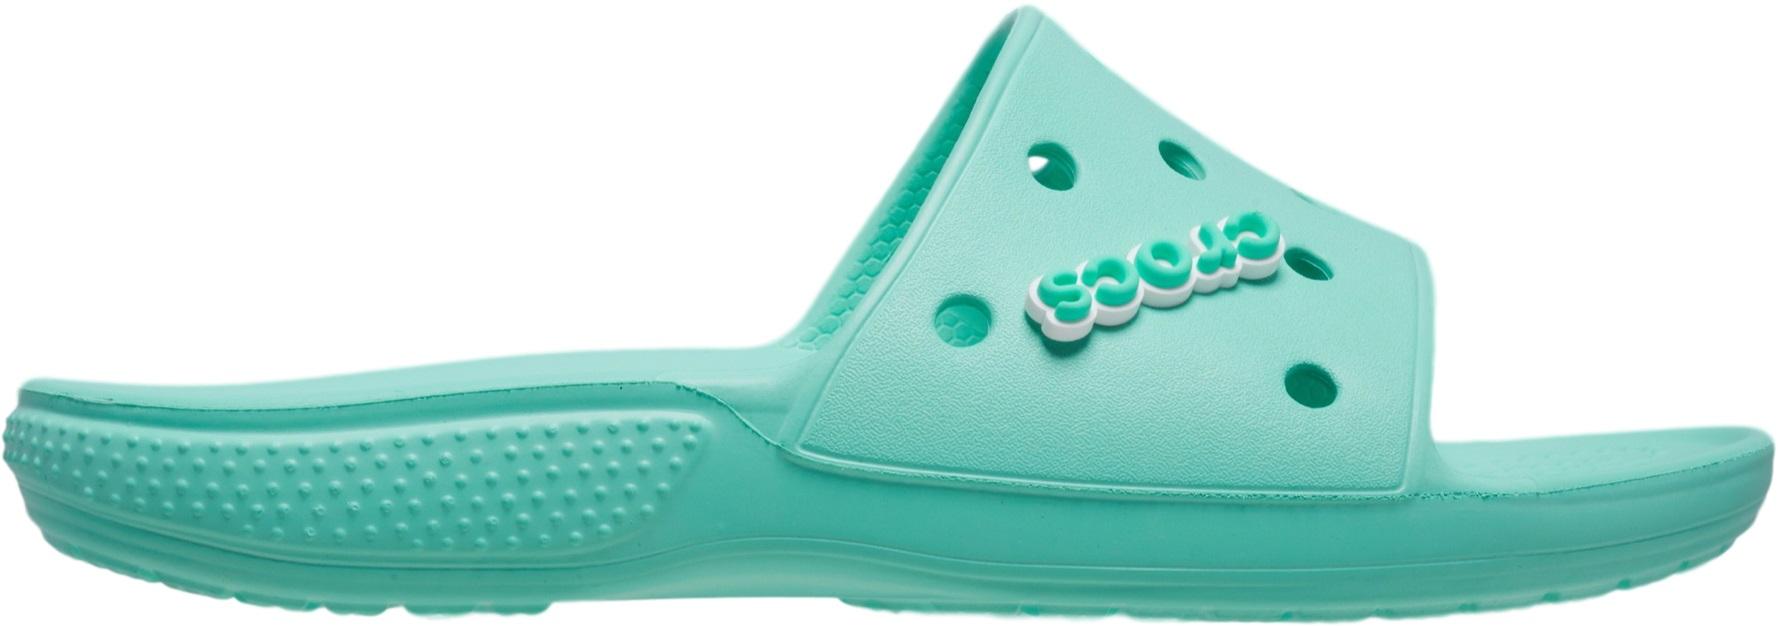 Crocs™ Classic Slide 206121 Pistachio 42,5